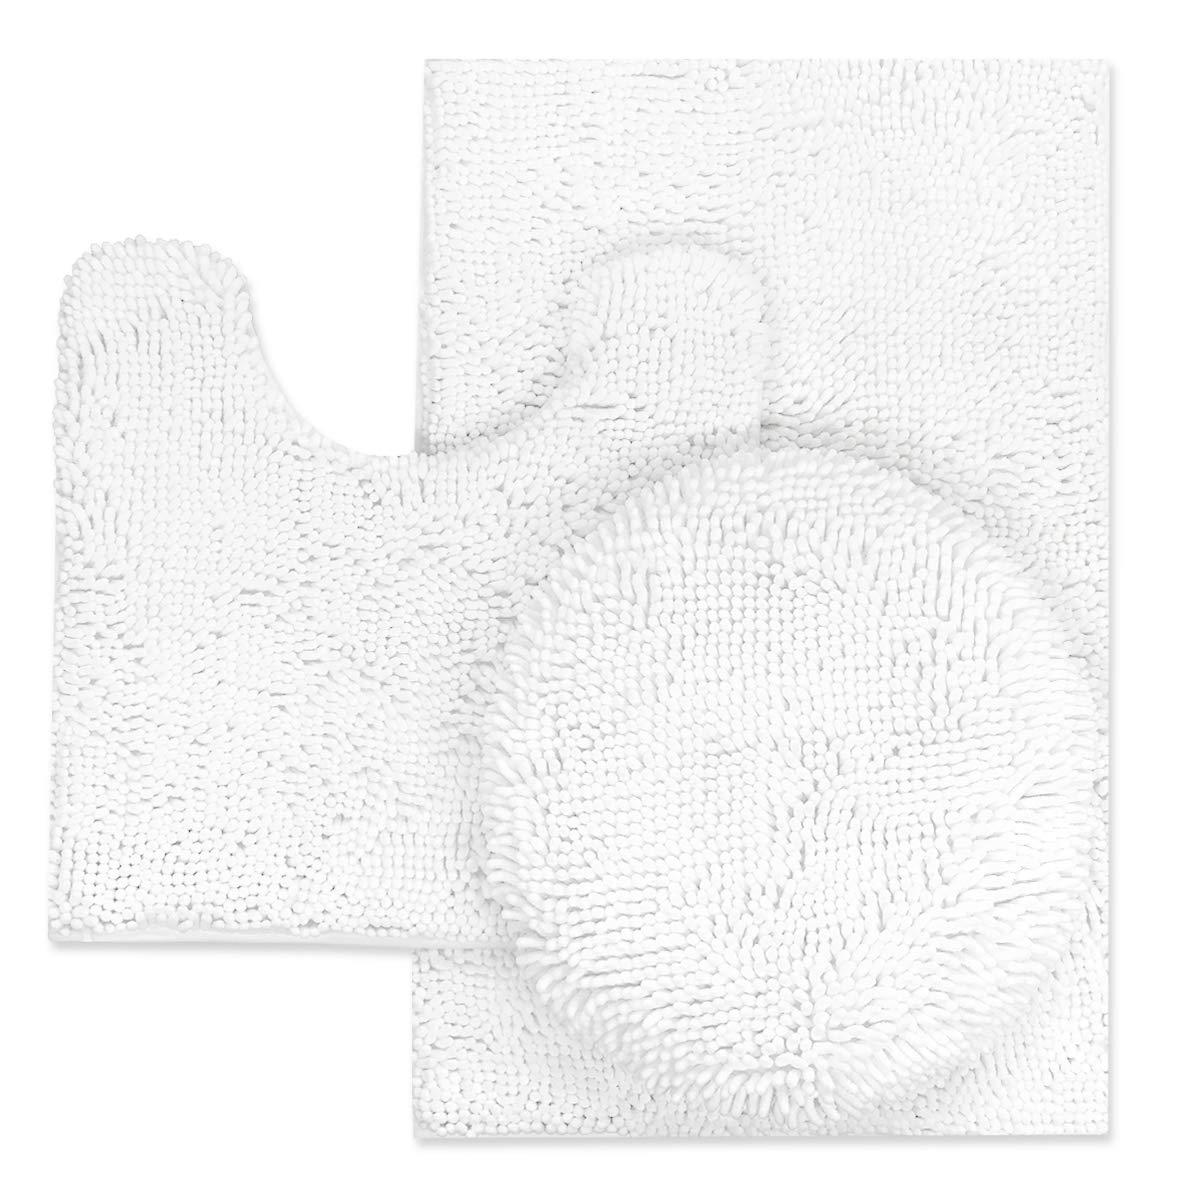 TREETONE Chenille Bath Mat 3 Piece Bathroom Rugs Set, 20x20 Inchs U-Shape Contoured Toilet Mat & 20x32 Inchs Rug & 1 Lid Cover,Soft,Water Absorbent Plush Rugs for Tub Shower & Bath Room -White